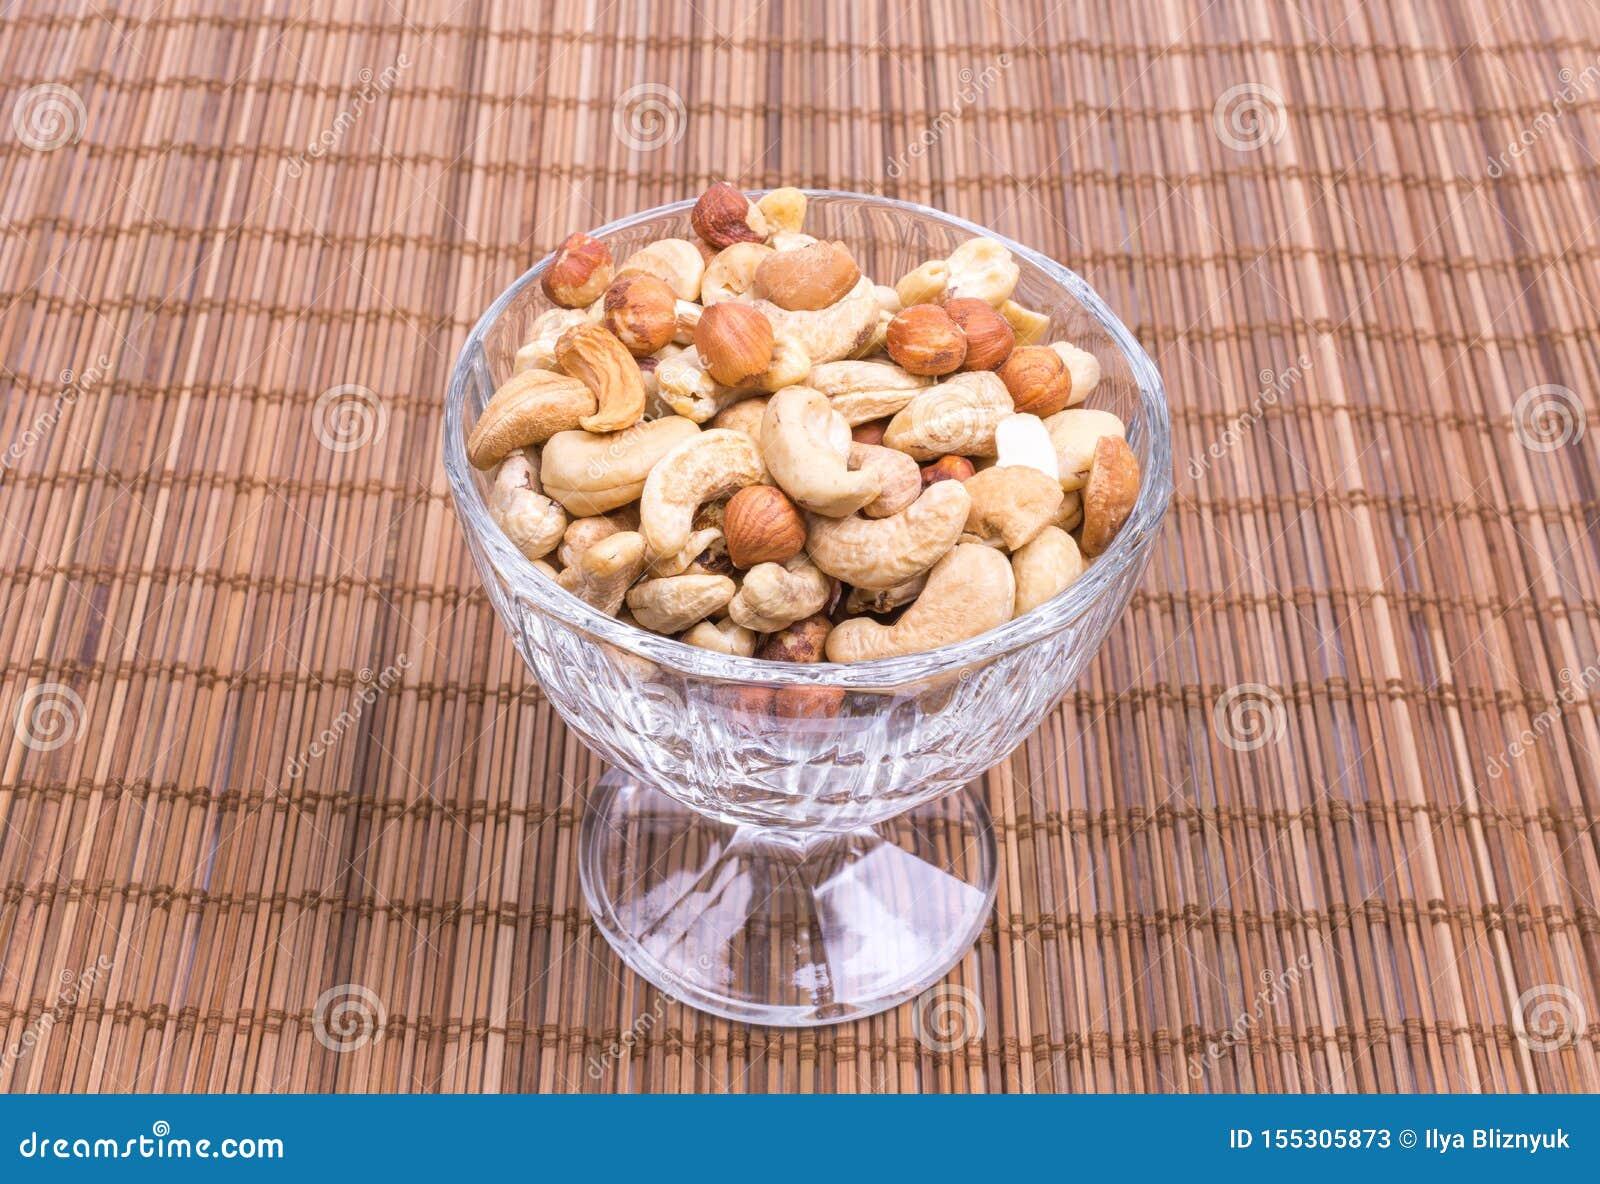 A mixture of cashew nuts, almonds, hazelnuts in a wine glass